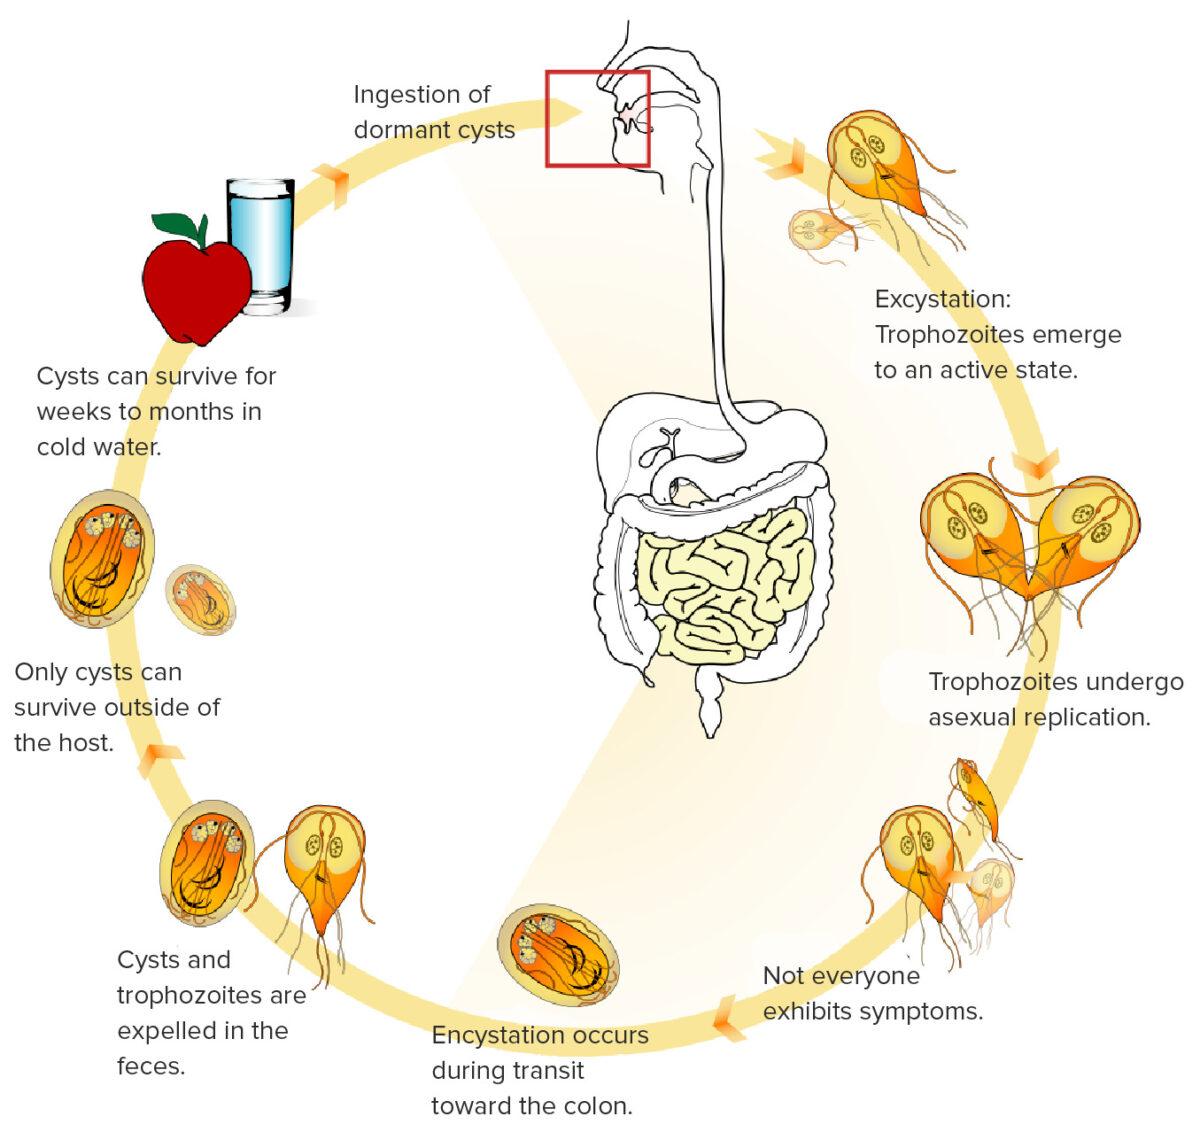 Cycle of Giardia lamblia